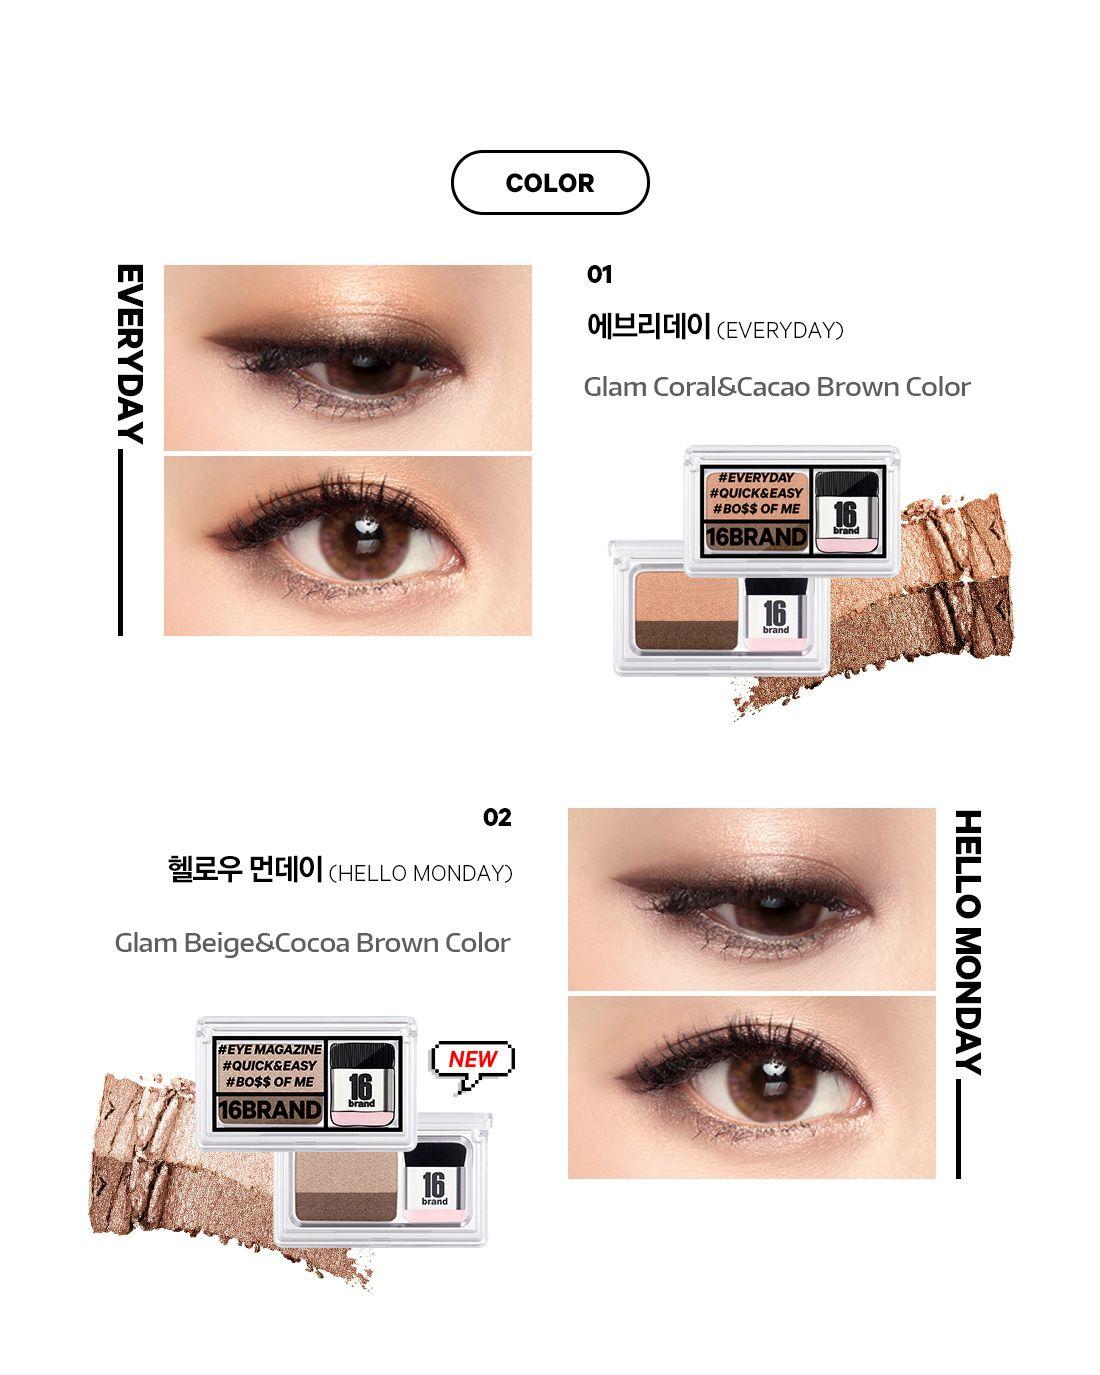 16 Brand 16 Eye Magazine 01 Every Day Beauty In 2019 Korean